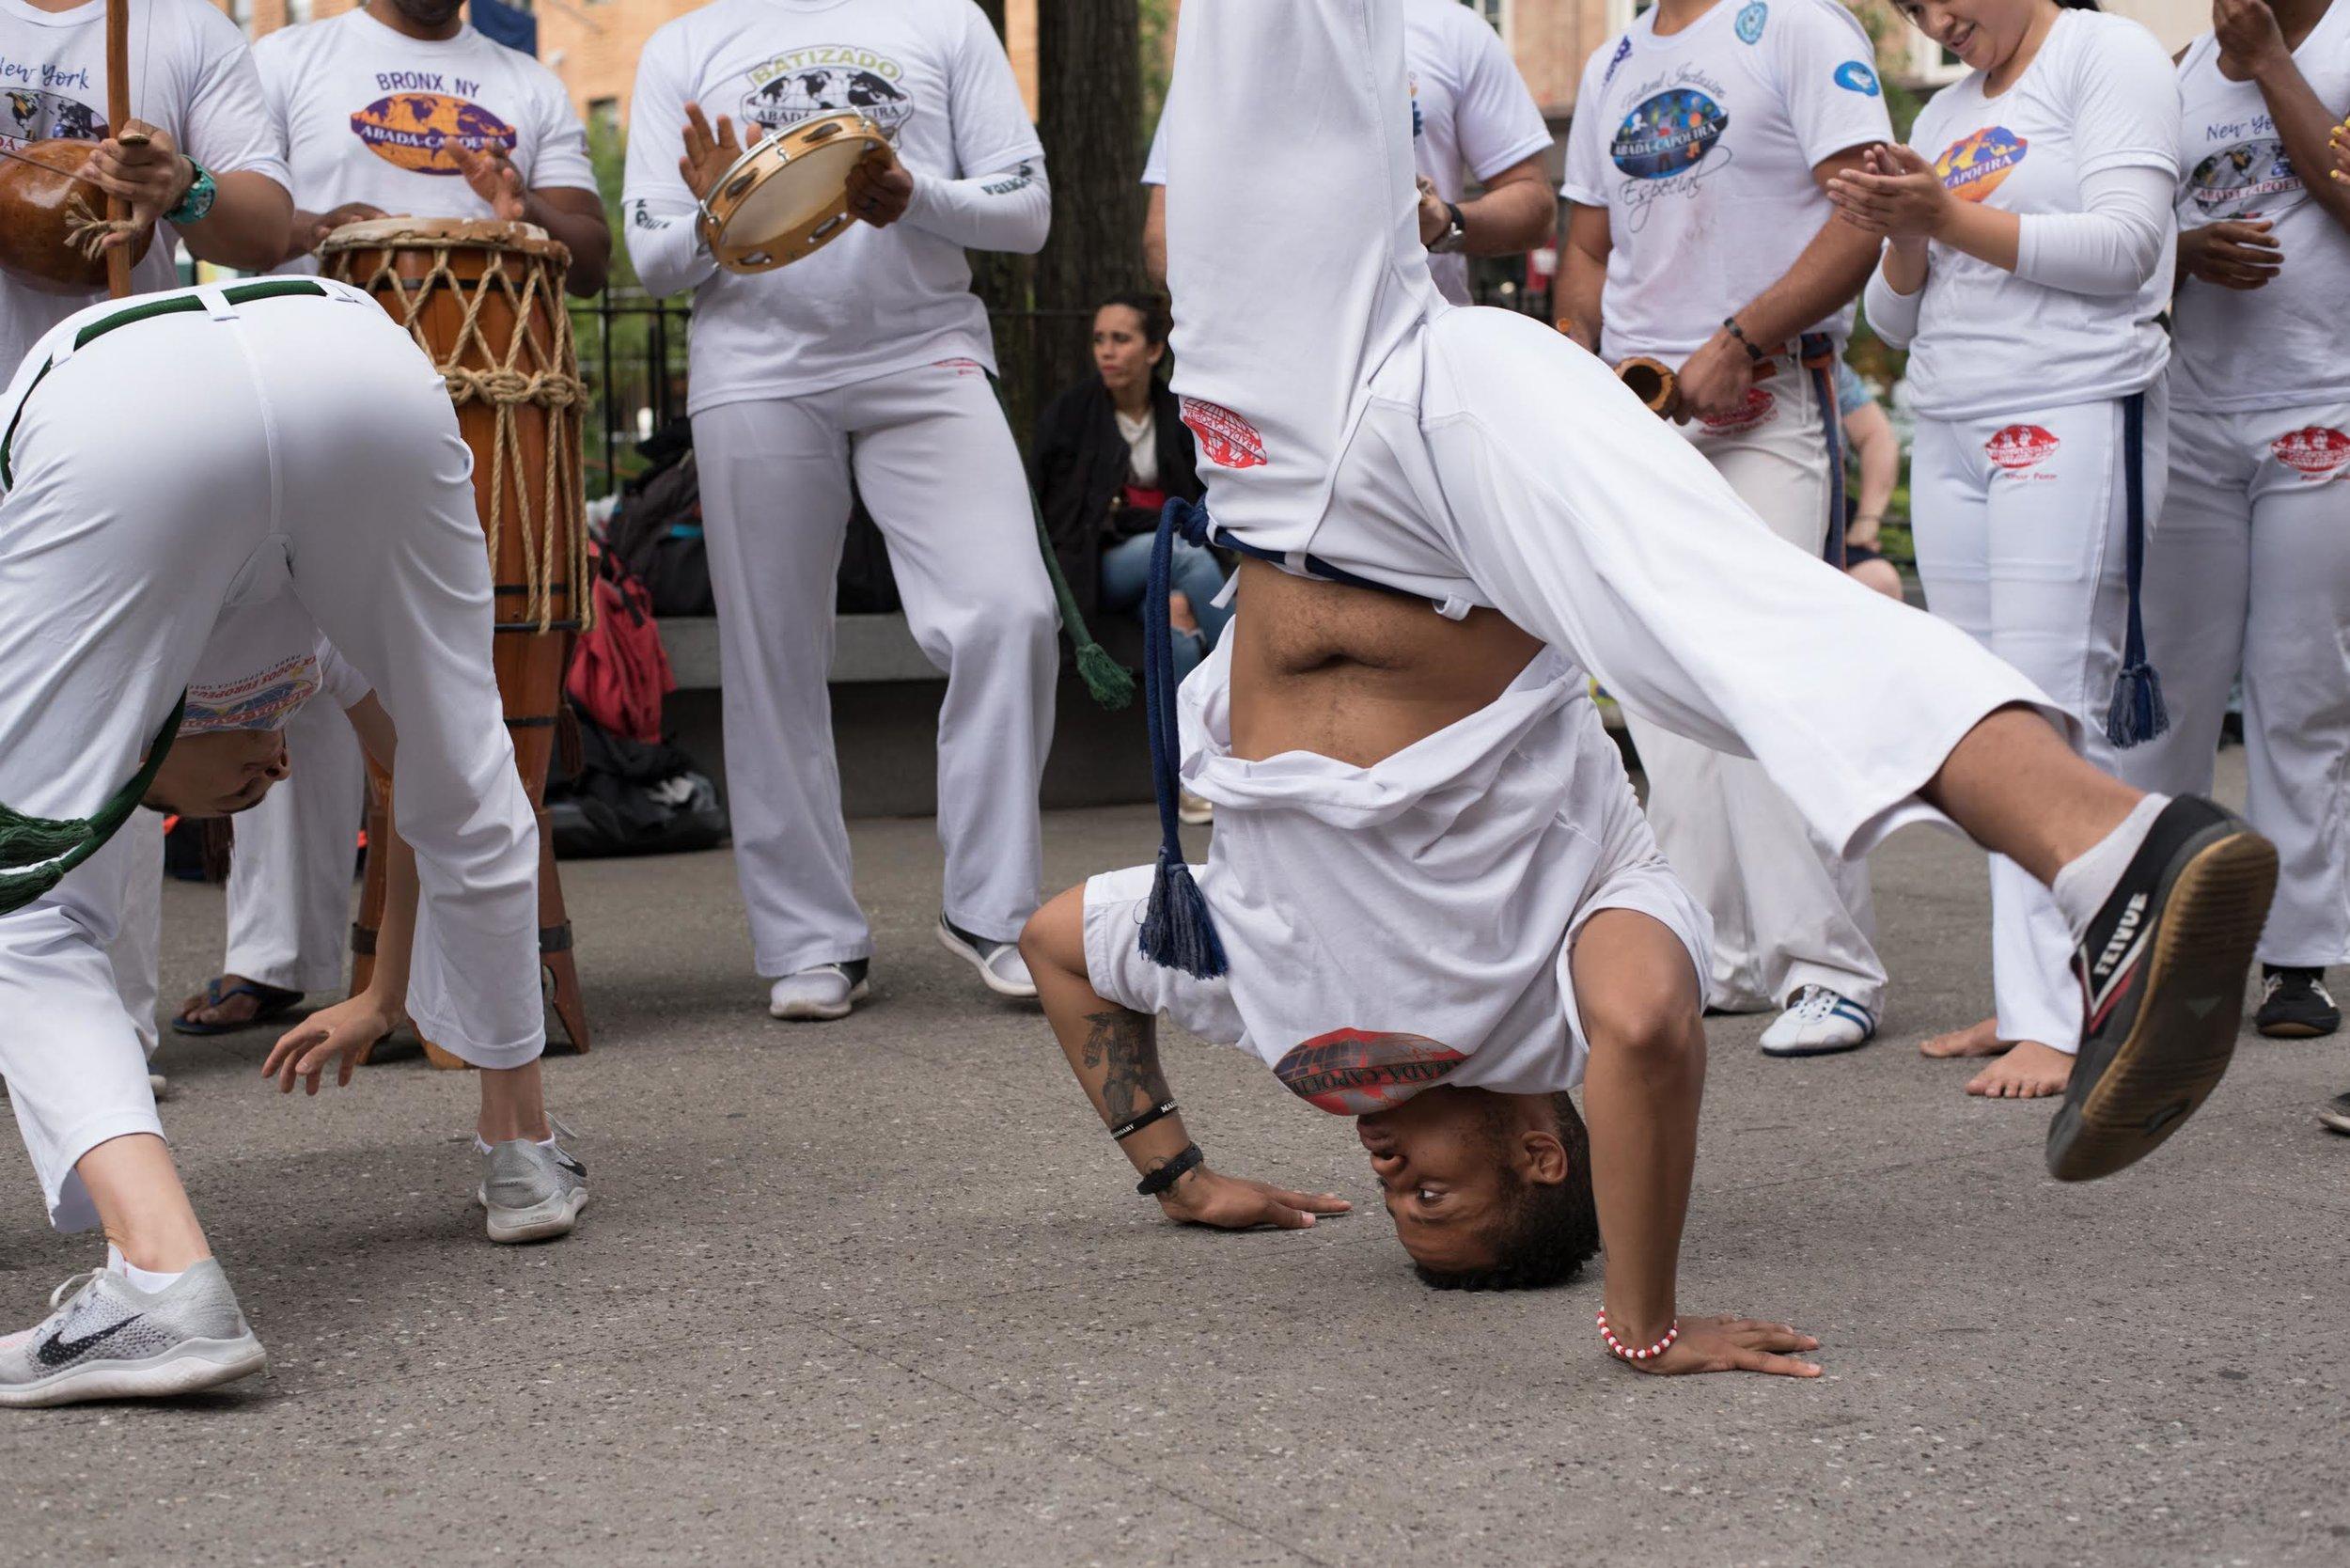 Open_roda_Capoeira east harlem NYC 1.jpg